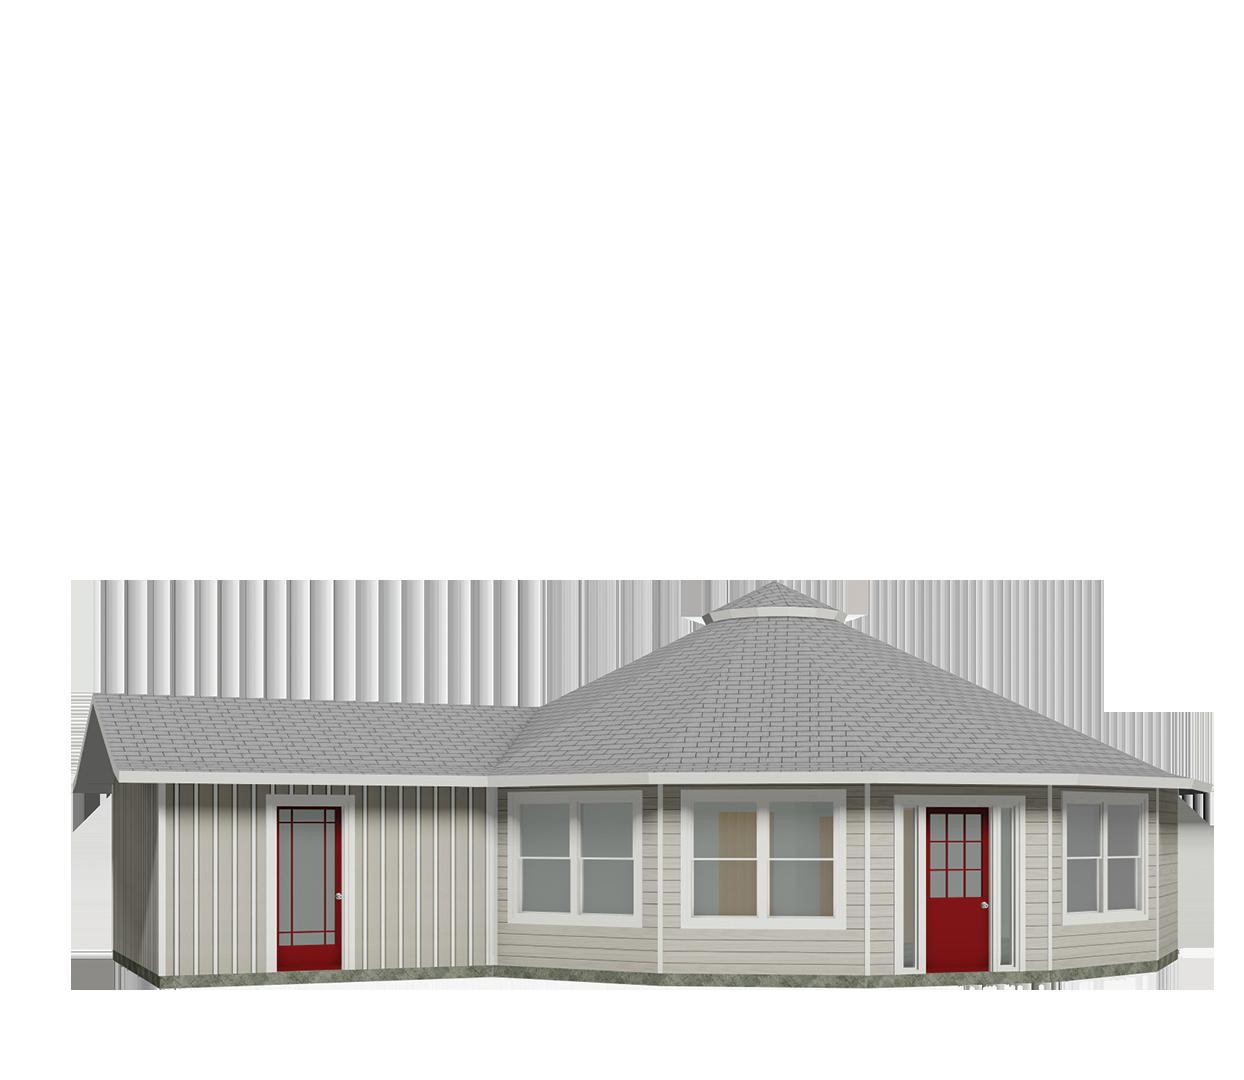 Energy Efficient Home Deltec Homes Use Stone Siding Like Hagrid S Hut Custom Floor Plans Plans Modern Building Design